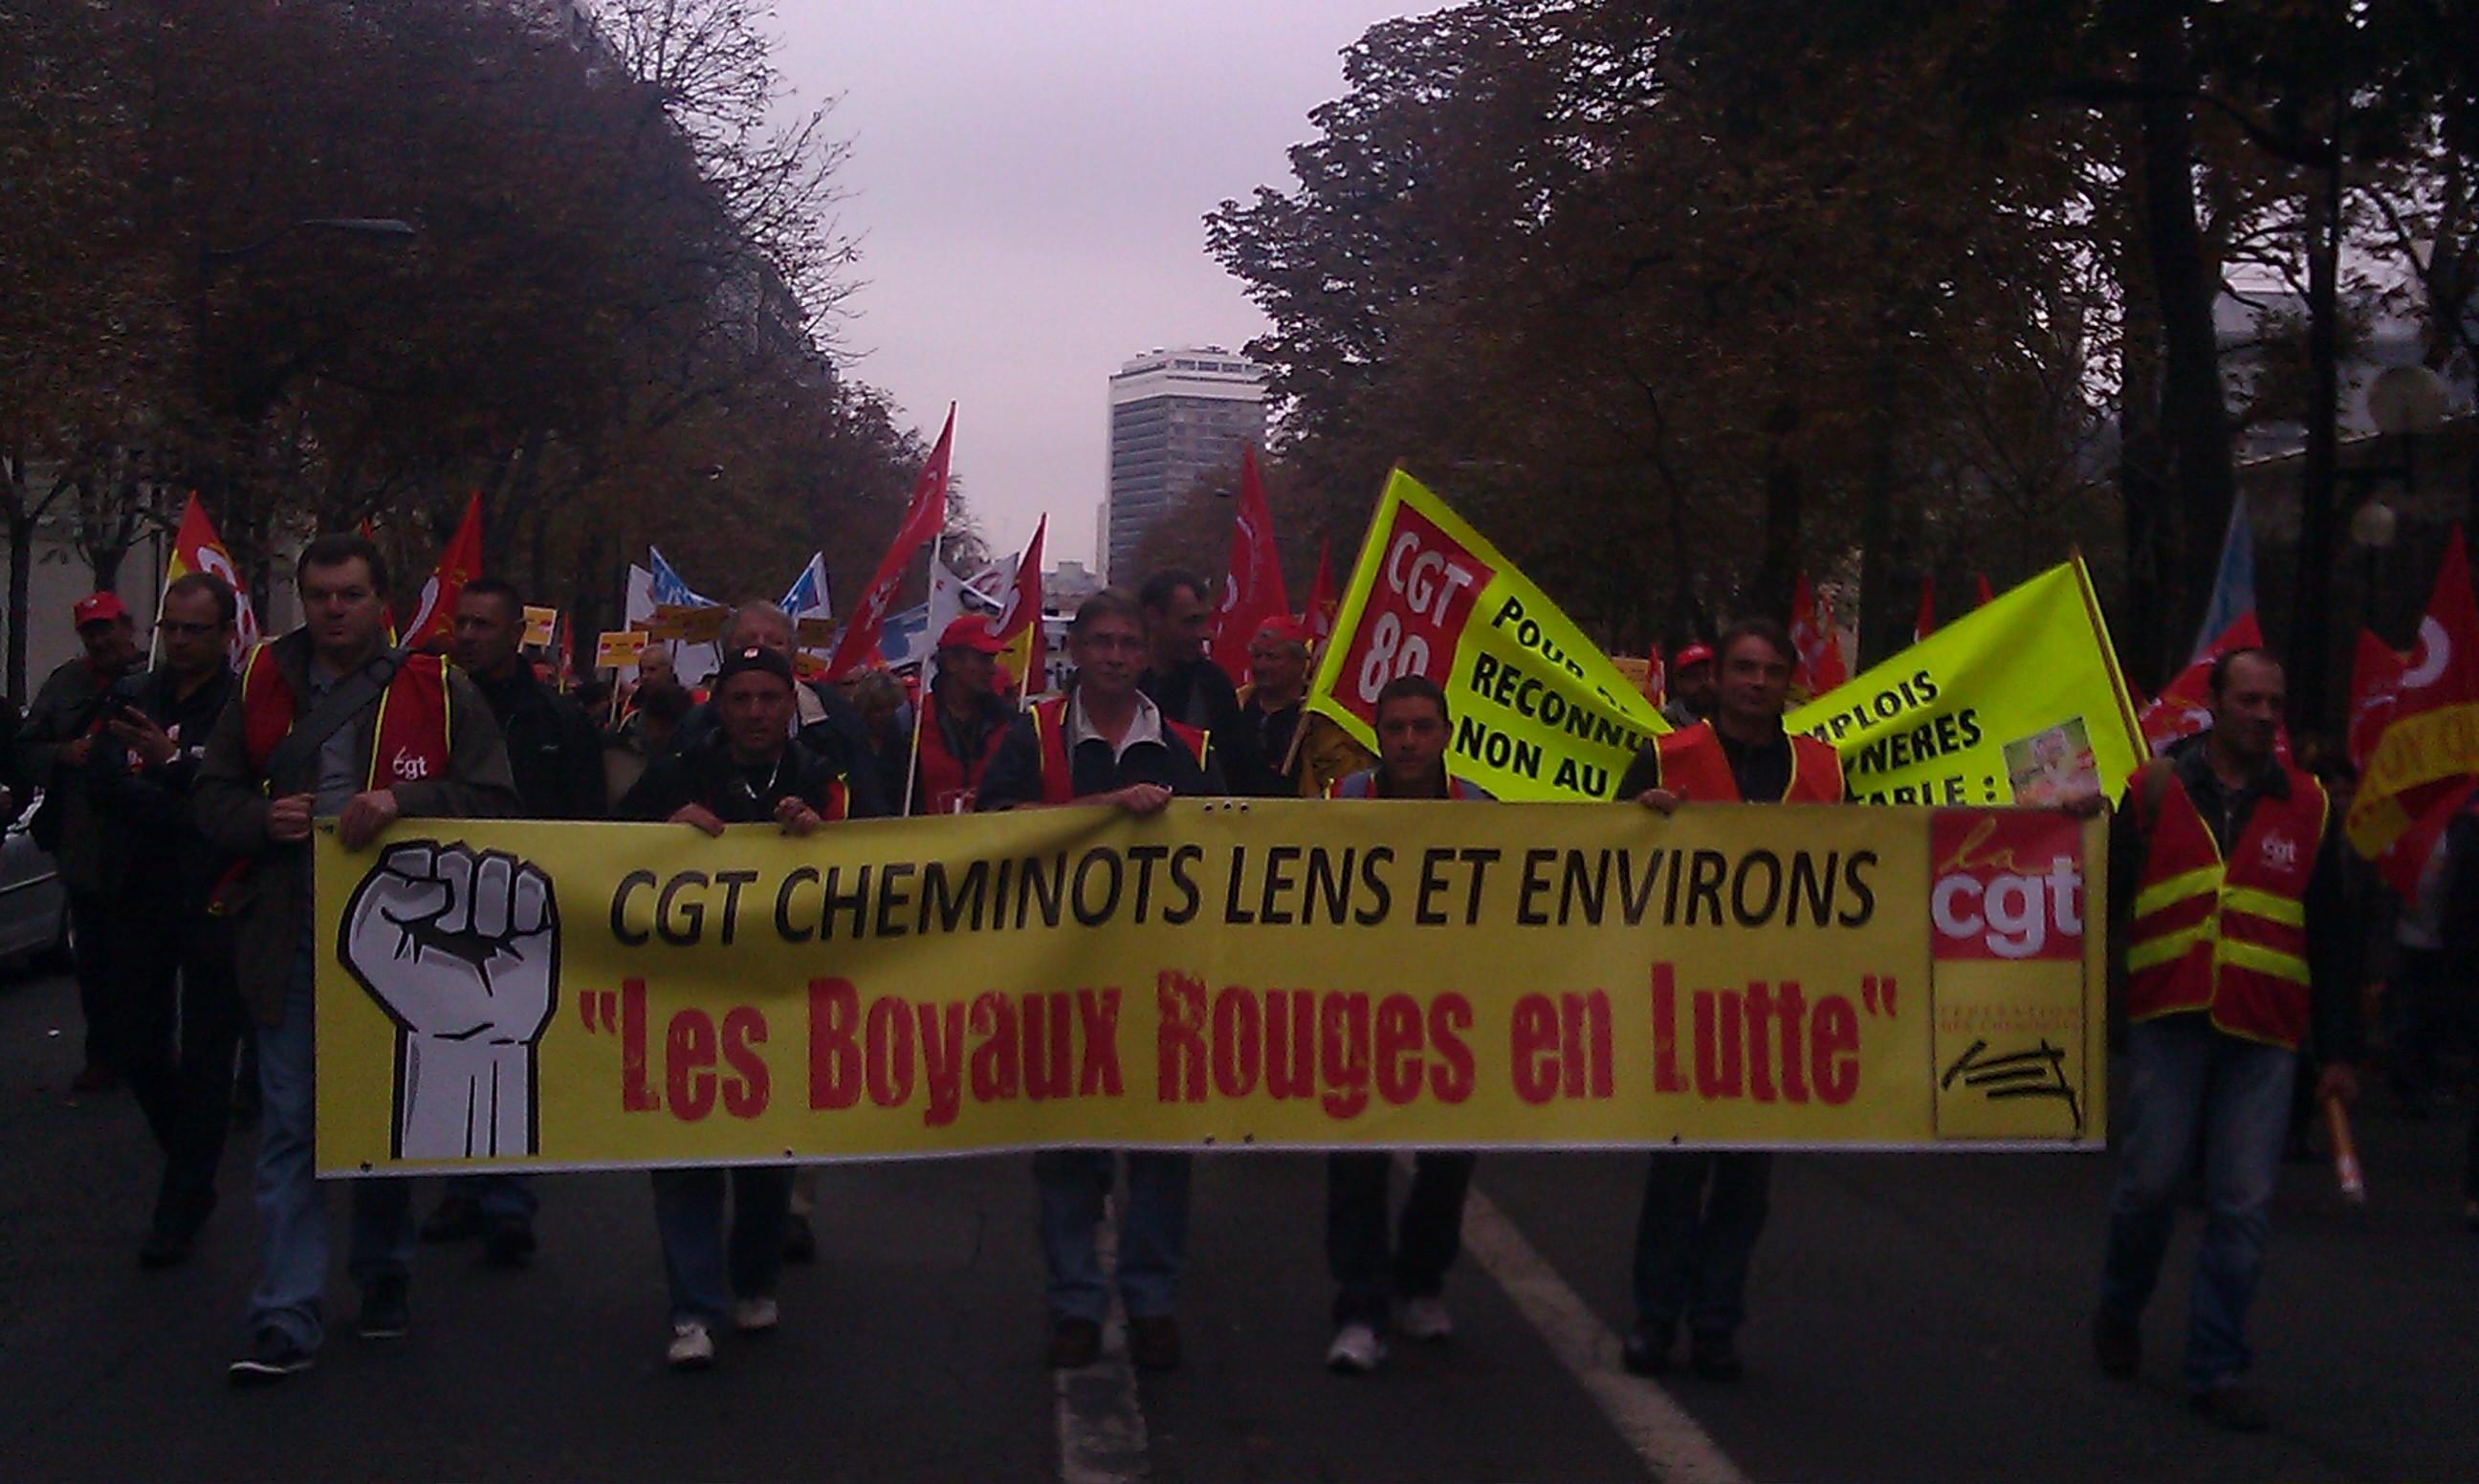 , CGT cheminots Lens et environs []